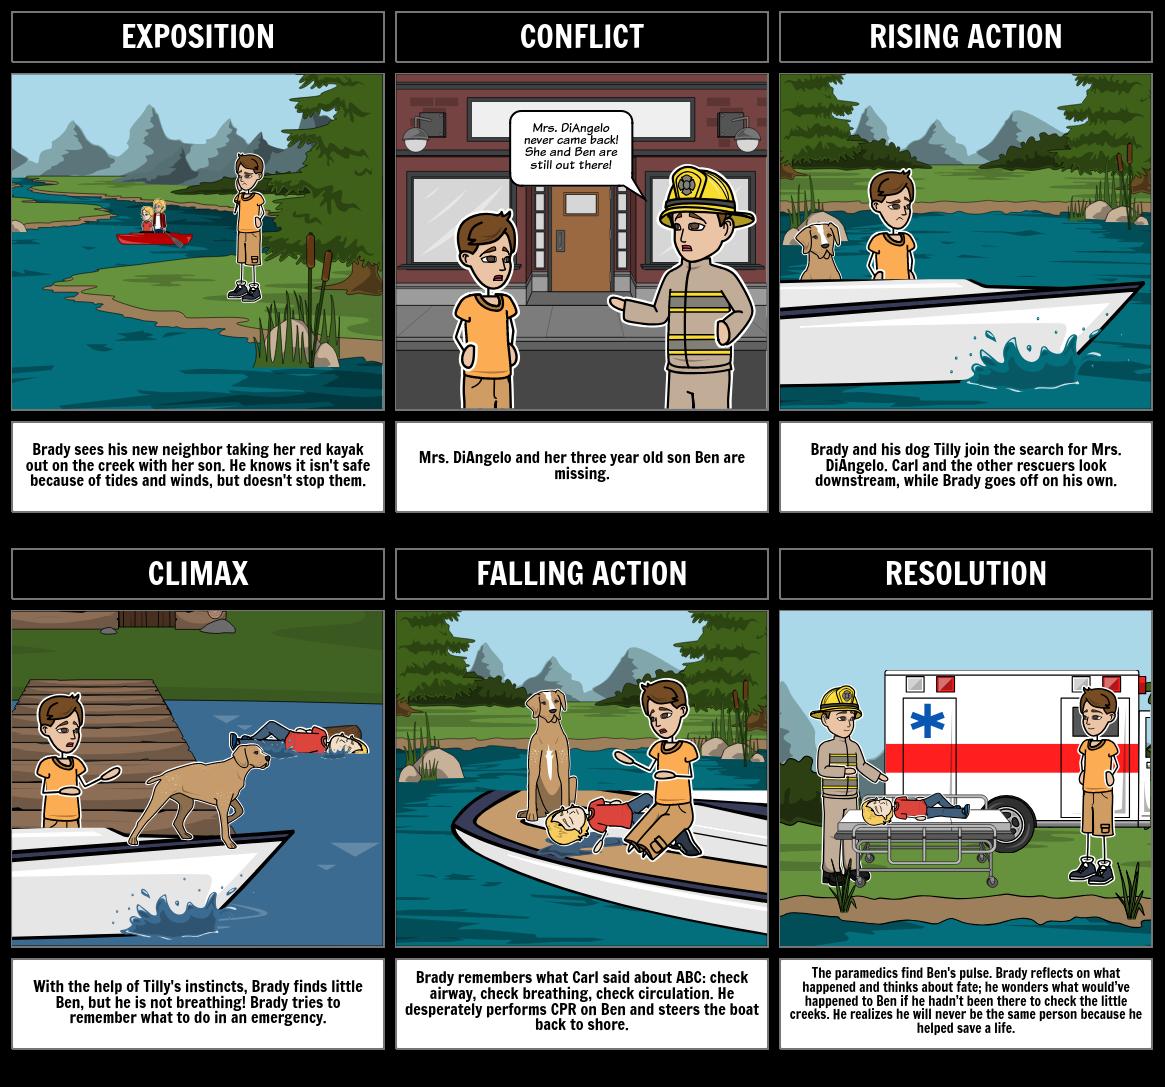 red kayak by priscilla cummings storyboard activities rh storyboardthat com Guide Canoe Canoe and Kayak